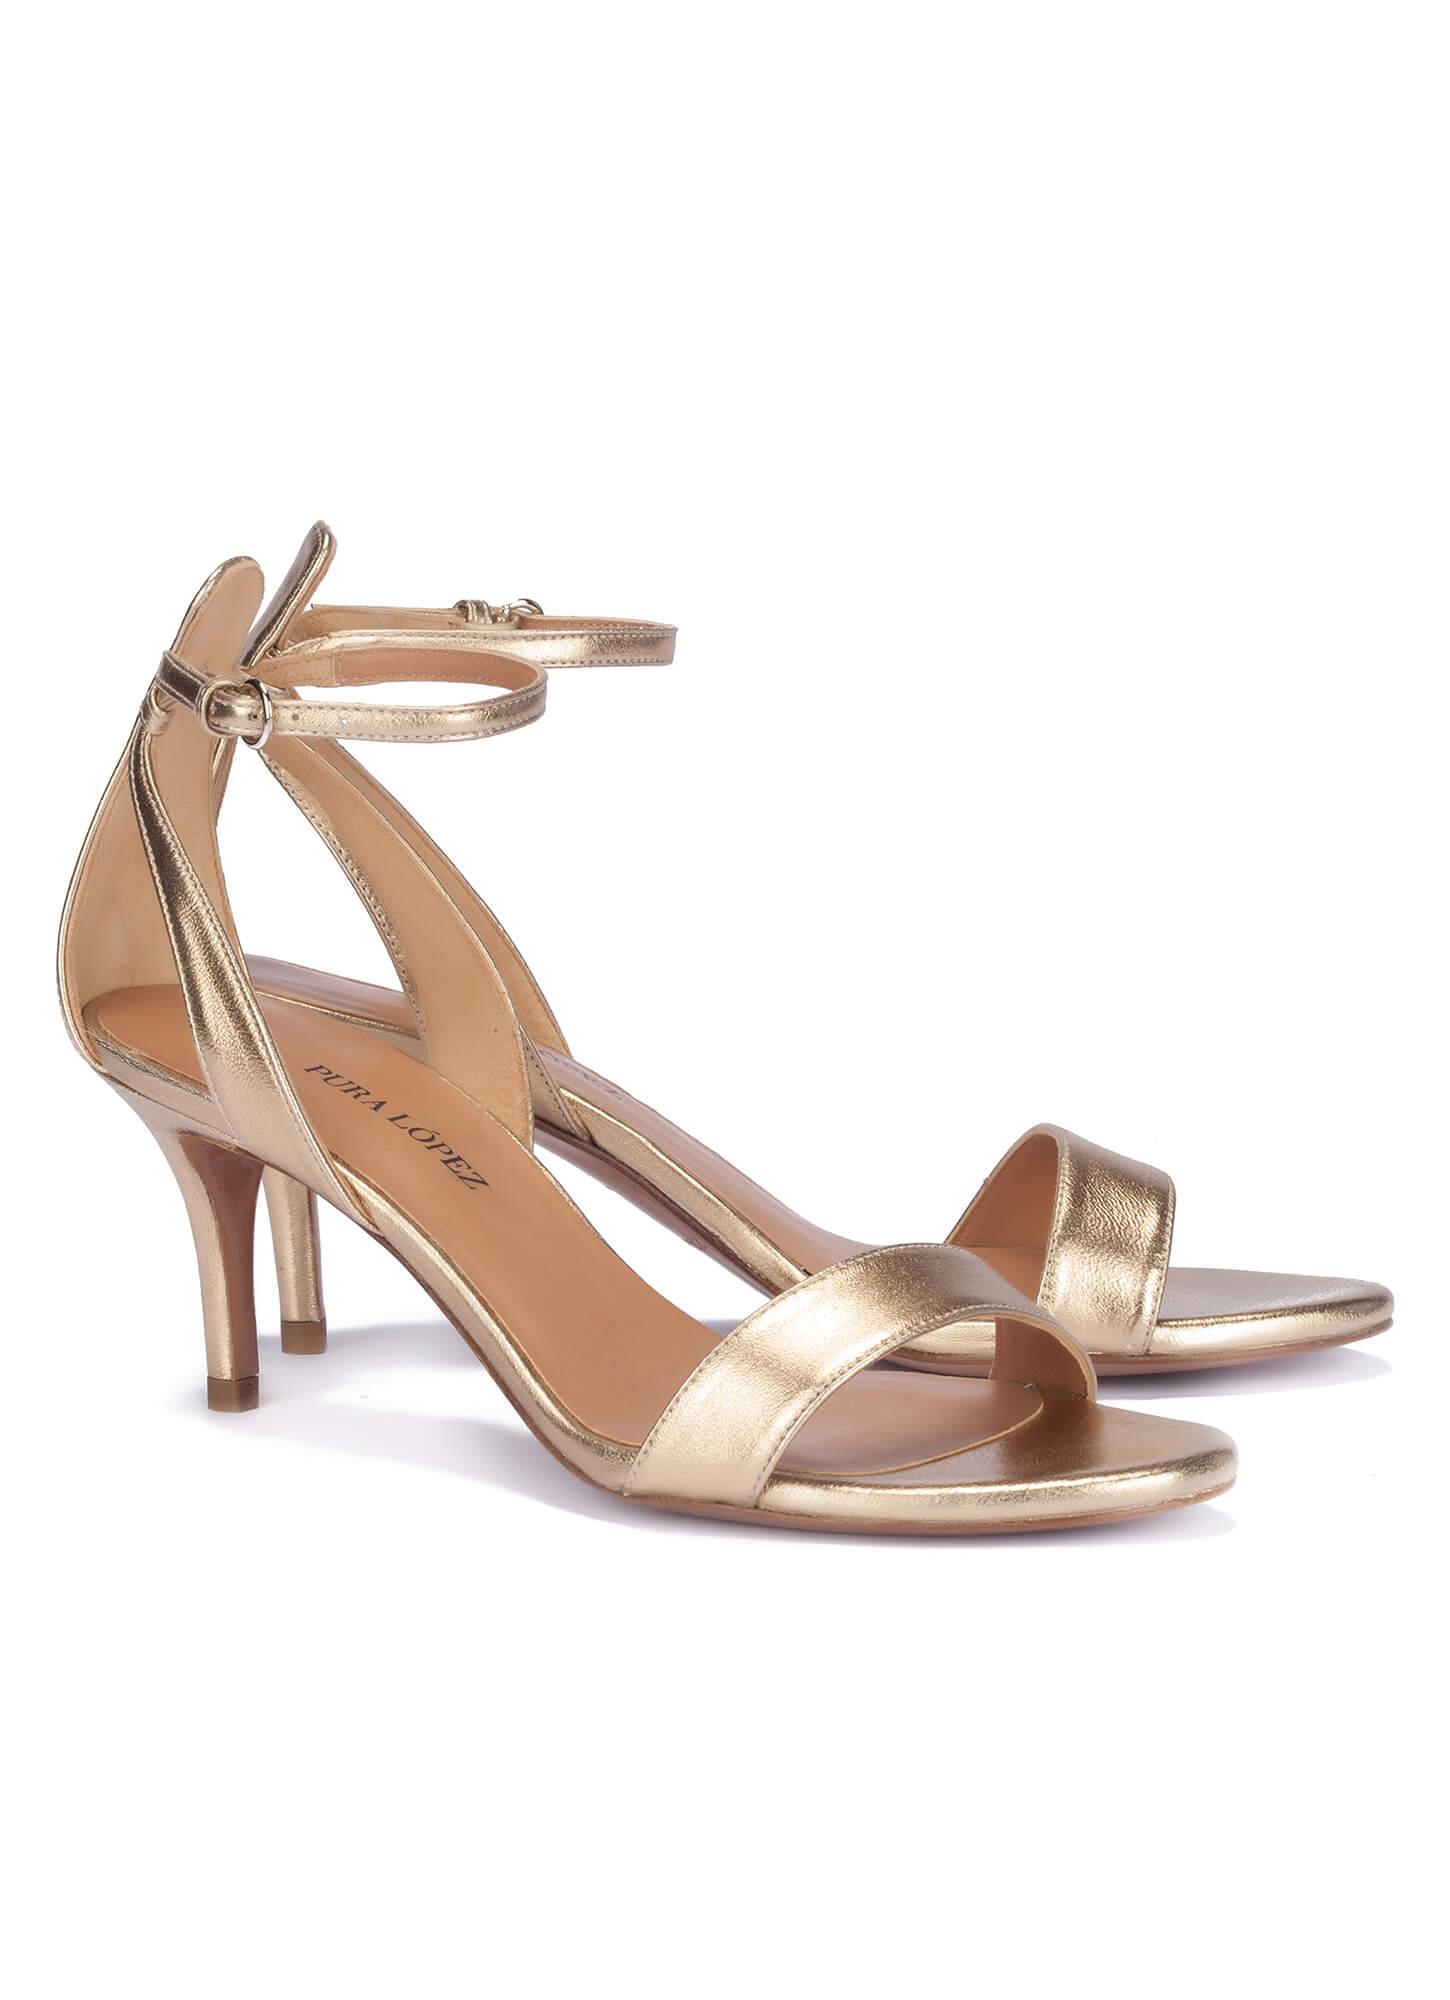 b7b1010521aa Mid heel sandals in gold leather - online shoe store Pura Lopez ...